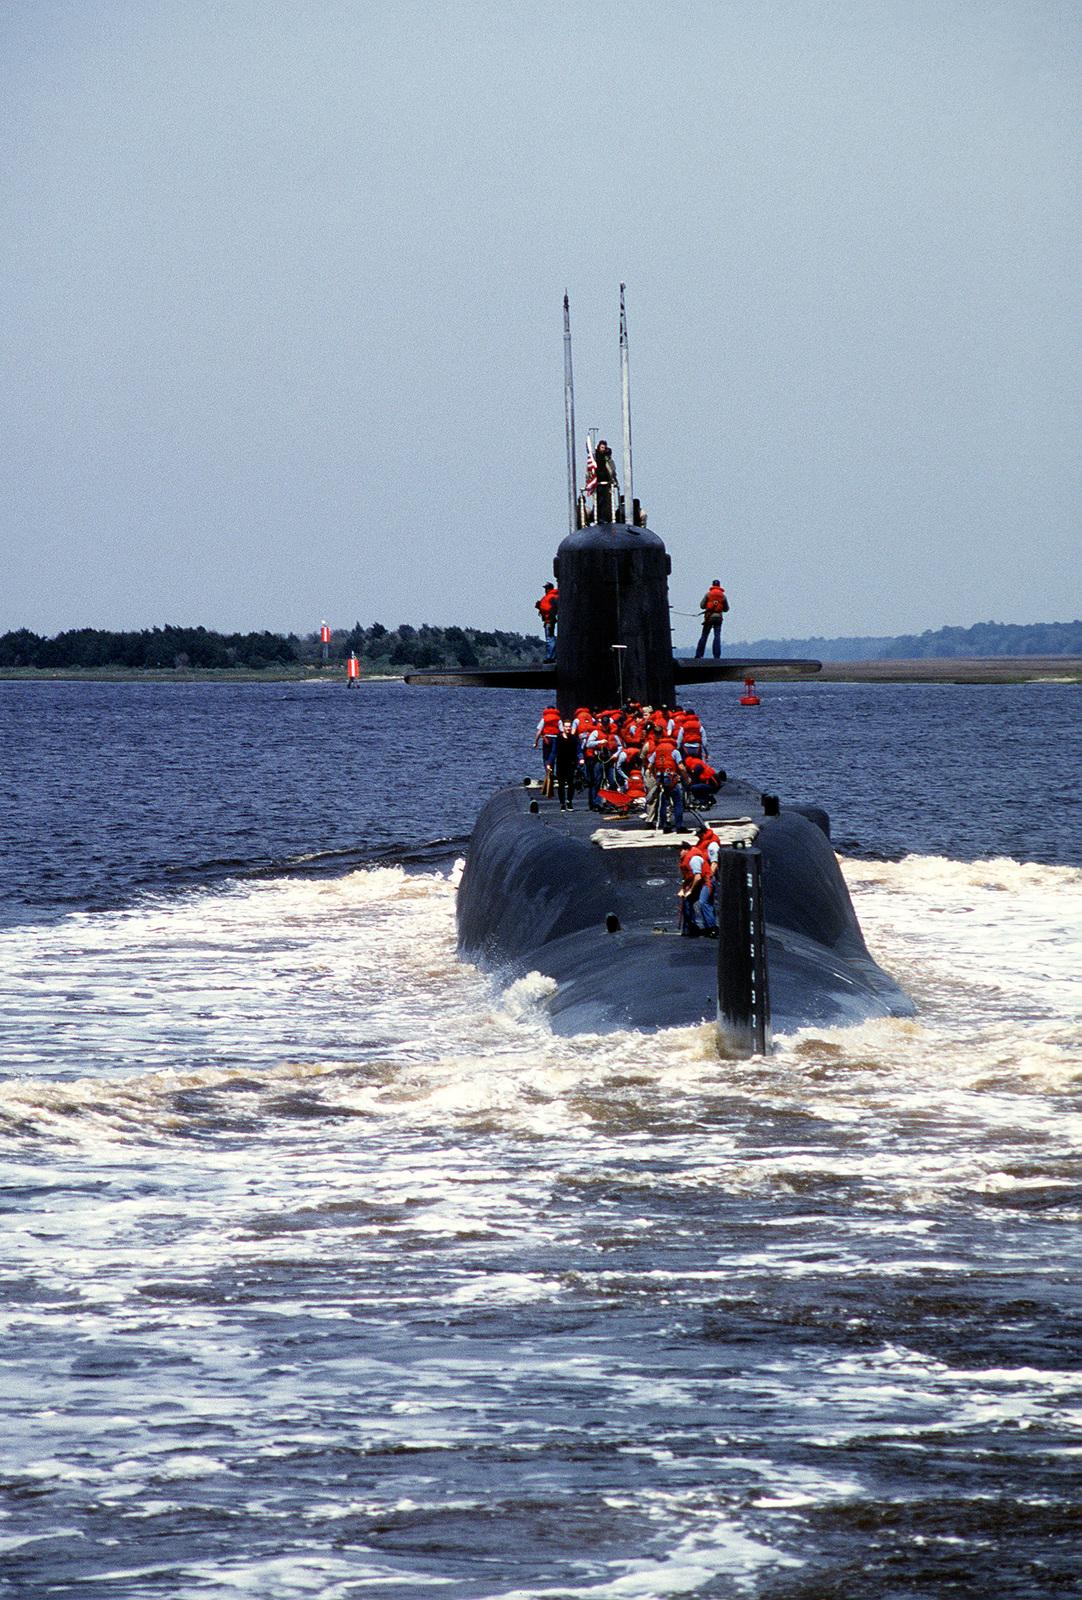 The fleet ballistic missile submarine USS MARIANO G  VALLEJO